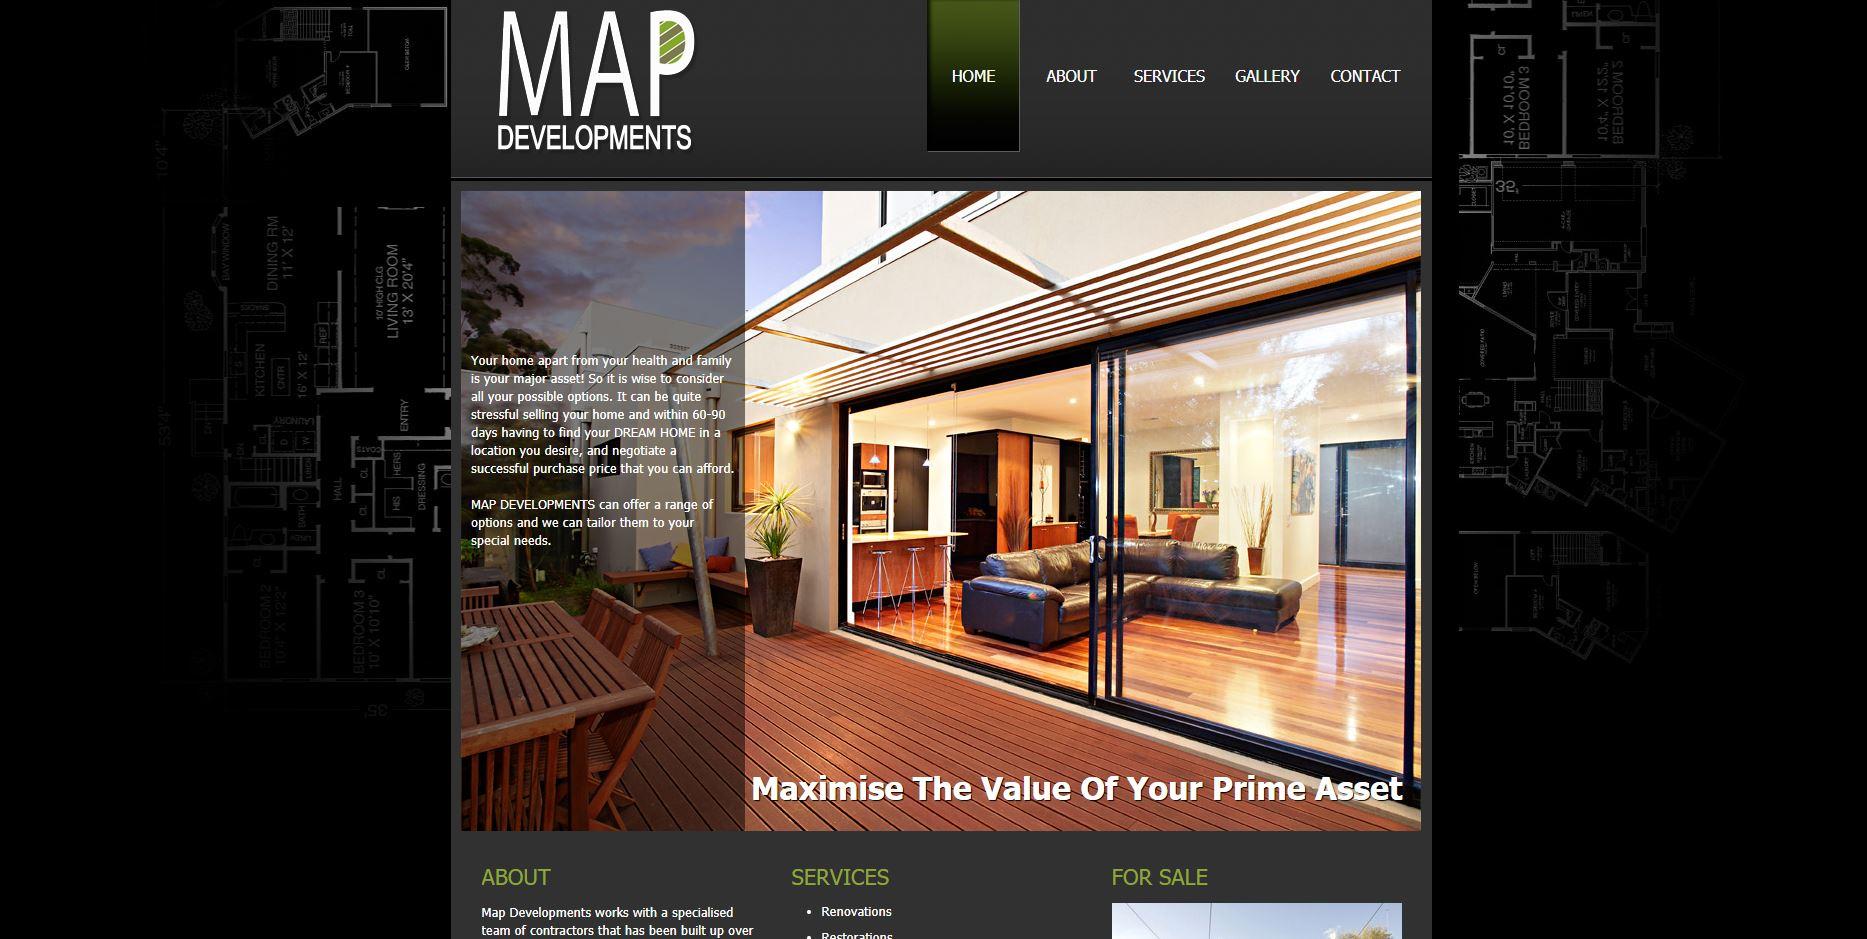 Map Developments